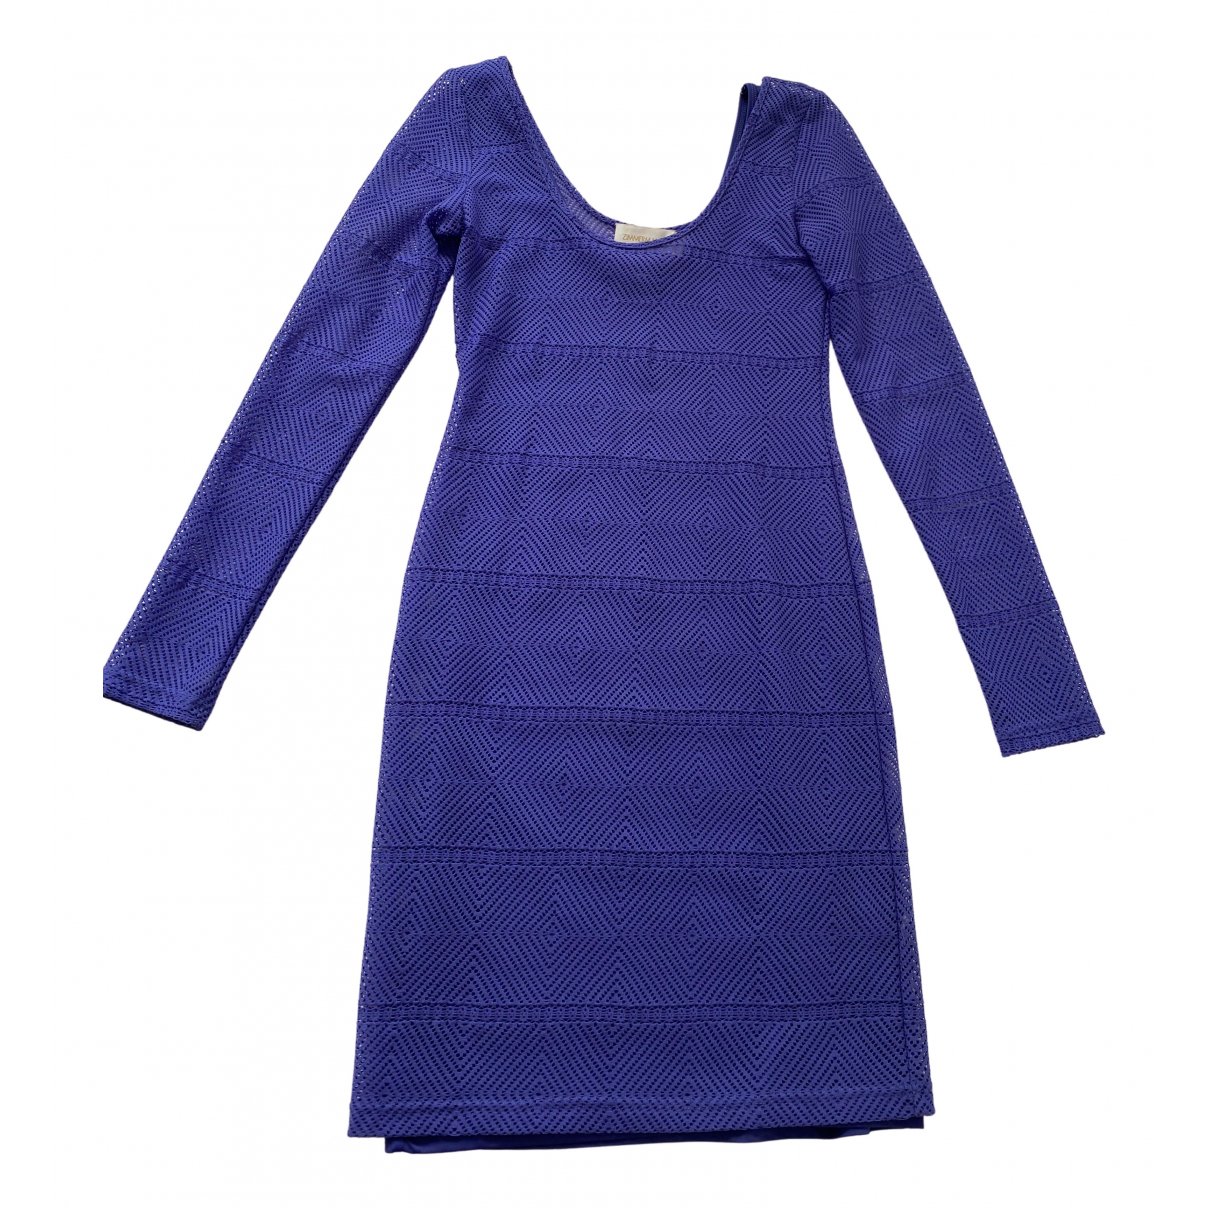 Zimmermann \N Kleid in  Lila Polyester